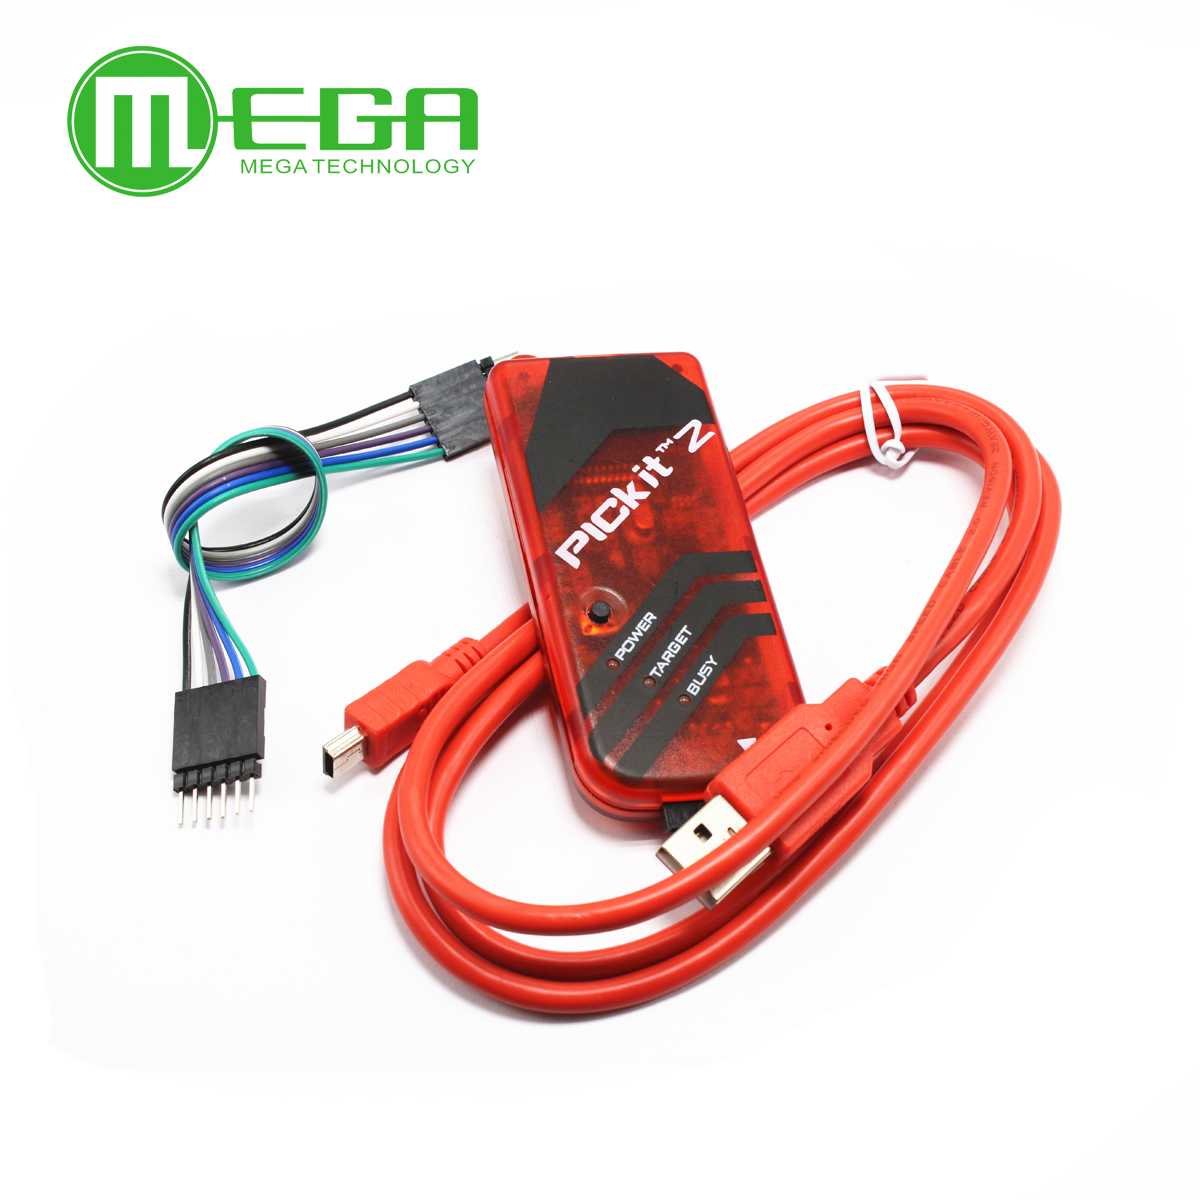 PICKIT2 PIC Kit2 Simulator PICKit 2 Programmer Emluator Rot Farbe w/USB kabel Dupond Draht